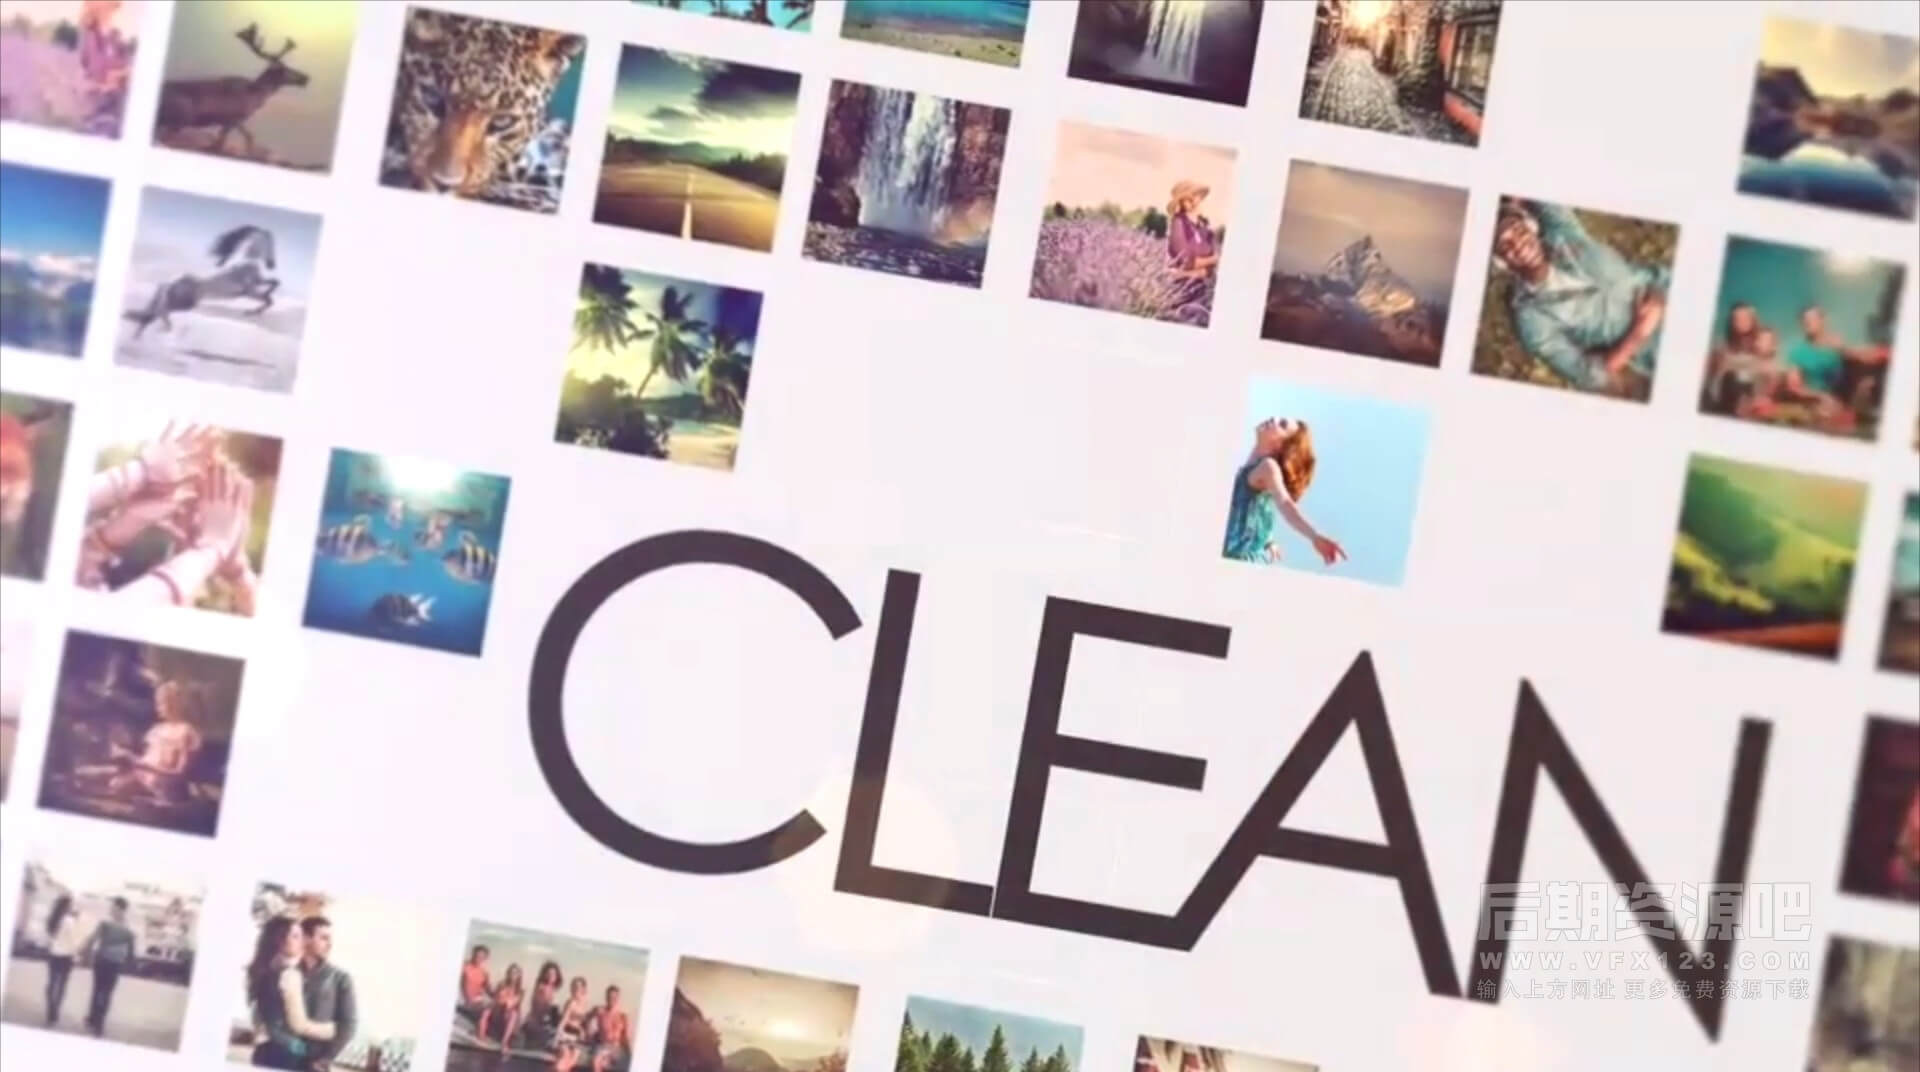 Motion片头片尾模板 照片墙多图背景幻灯片开场 Clean Big Slideshow